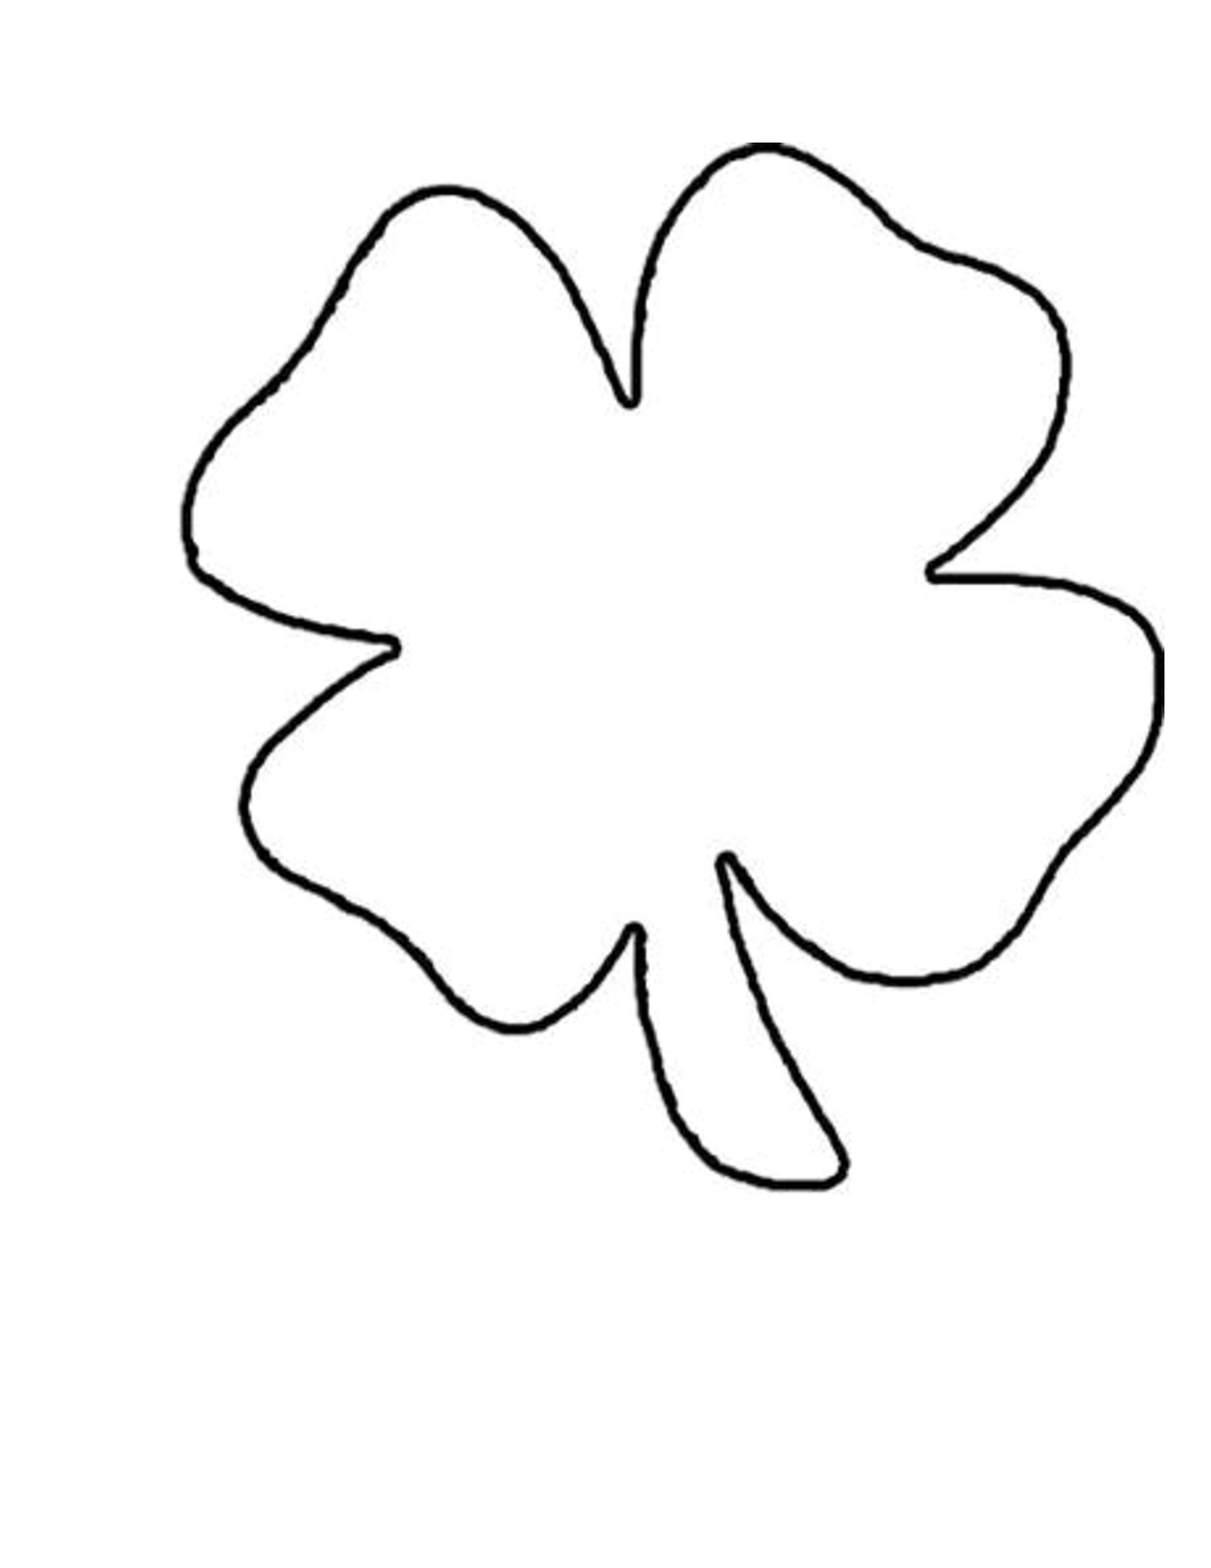 Four Leaf Clover Printables